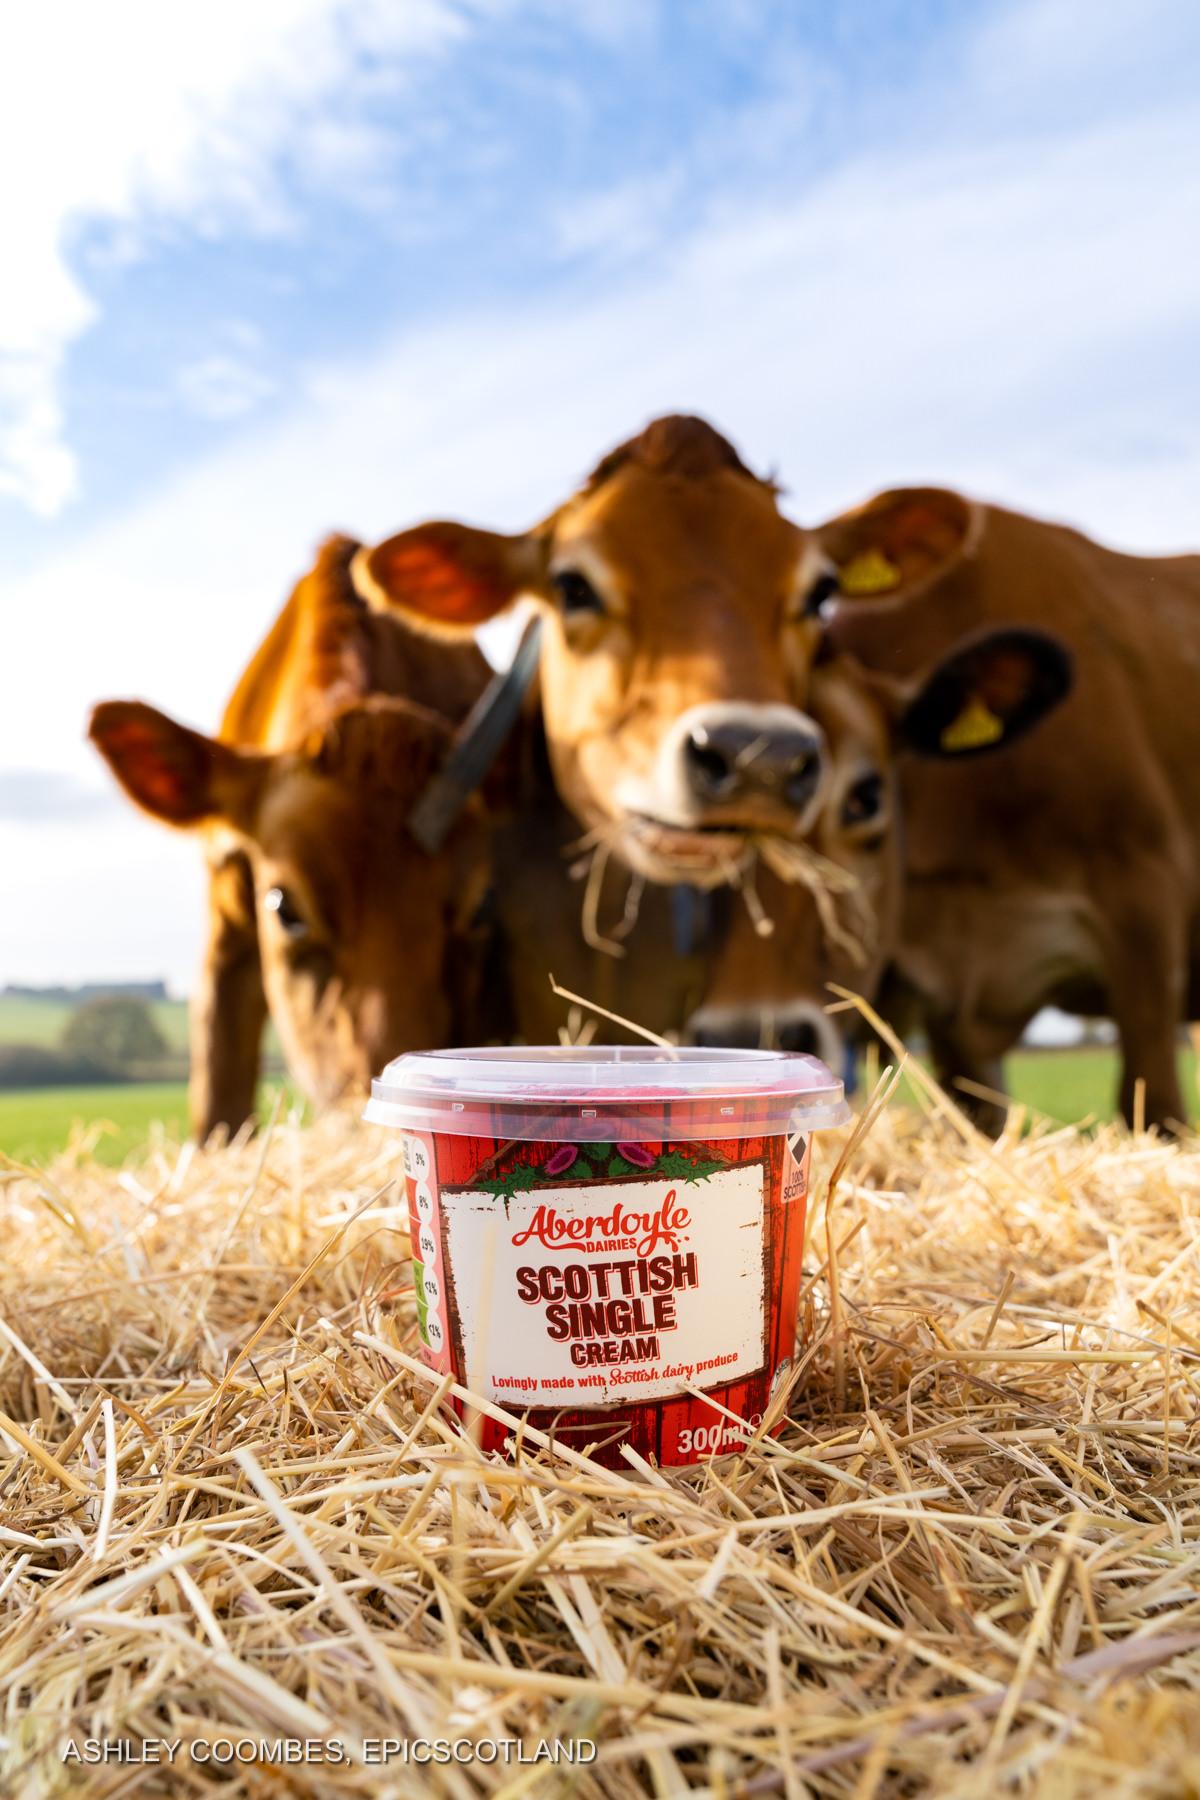 Aberdoyle Scottish Single Cream with cows